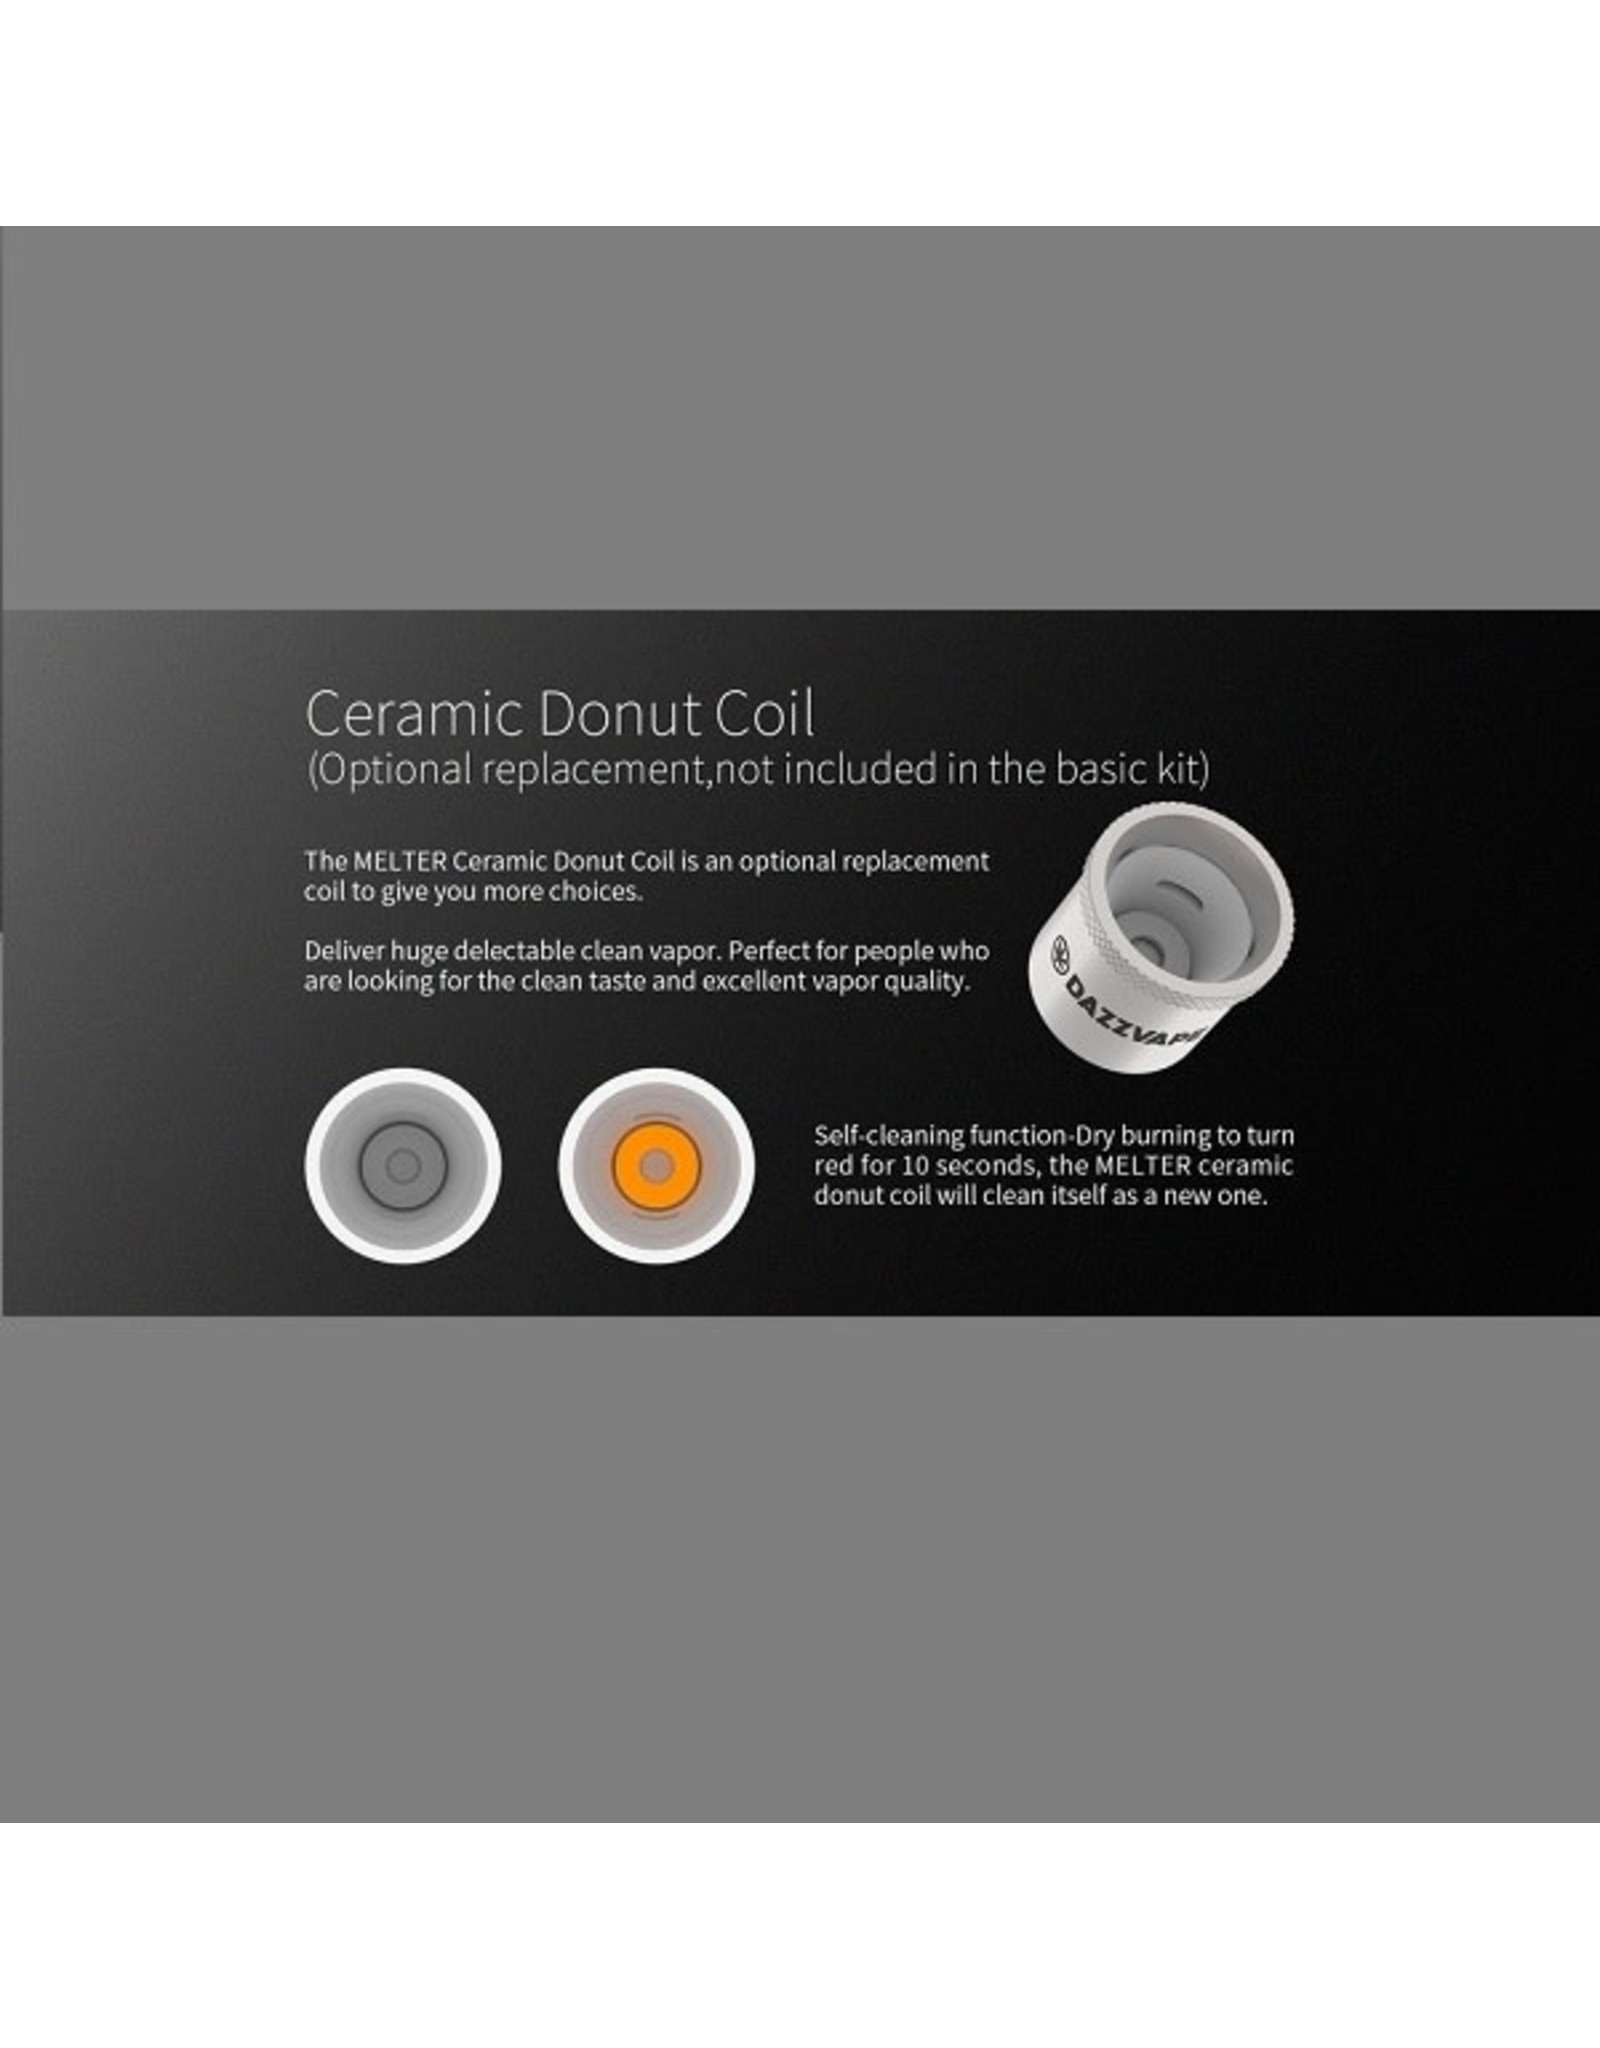 DazzVape DazzVape MELTER Replacement Coils - Ceramic Donut Best Wattage: 20-25W / TC 280-380 F Single